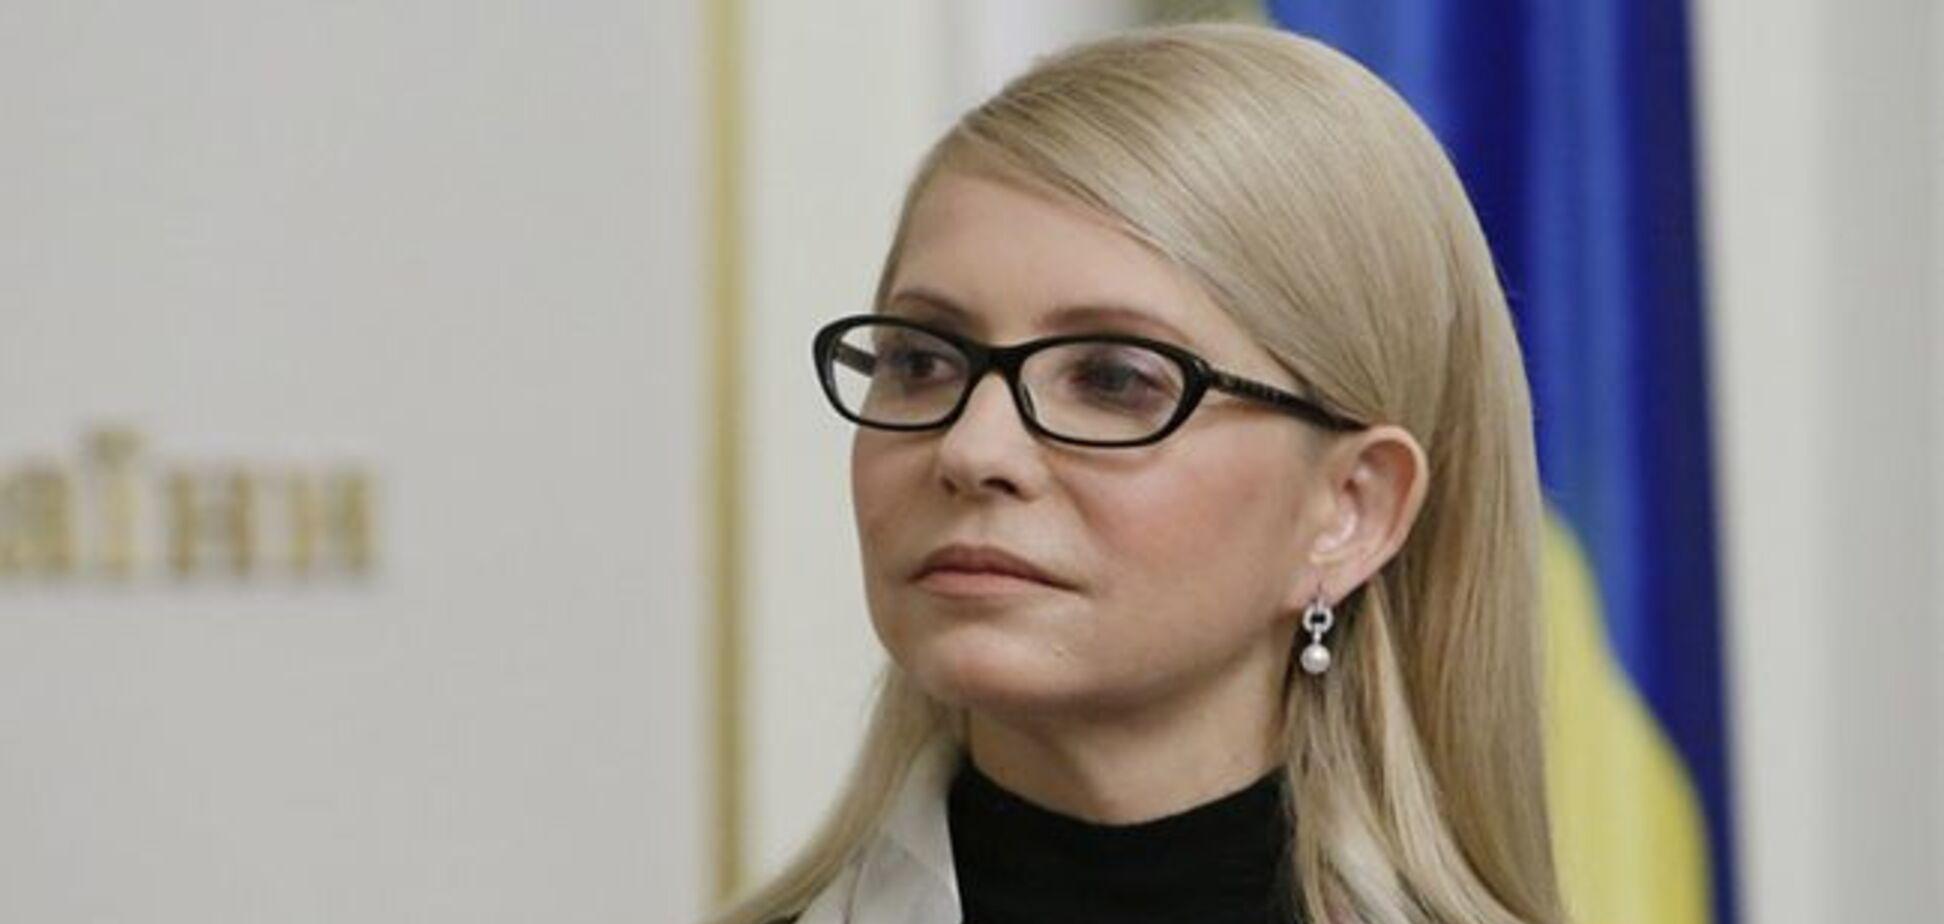 Тимошенко решила идти в суд из-за меморандума с МВФ